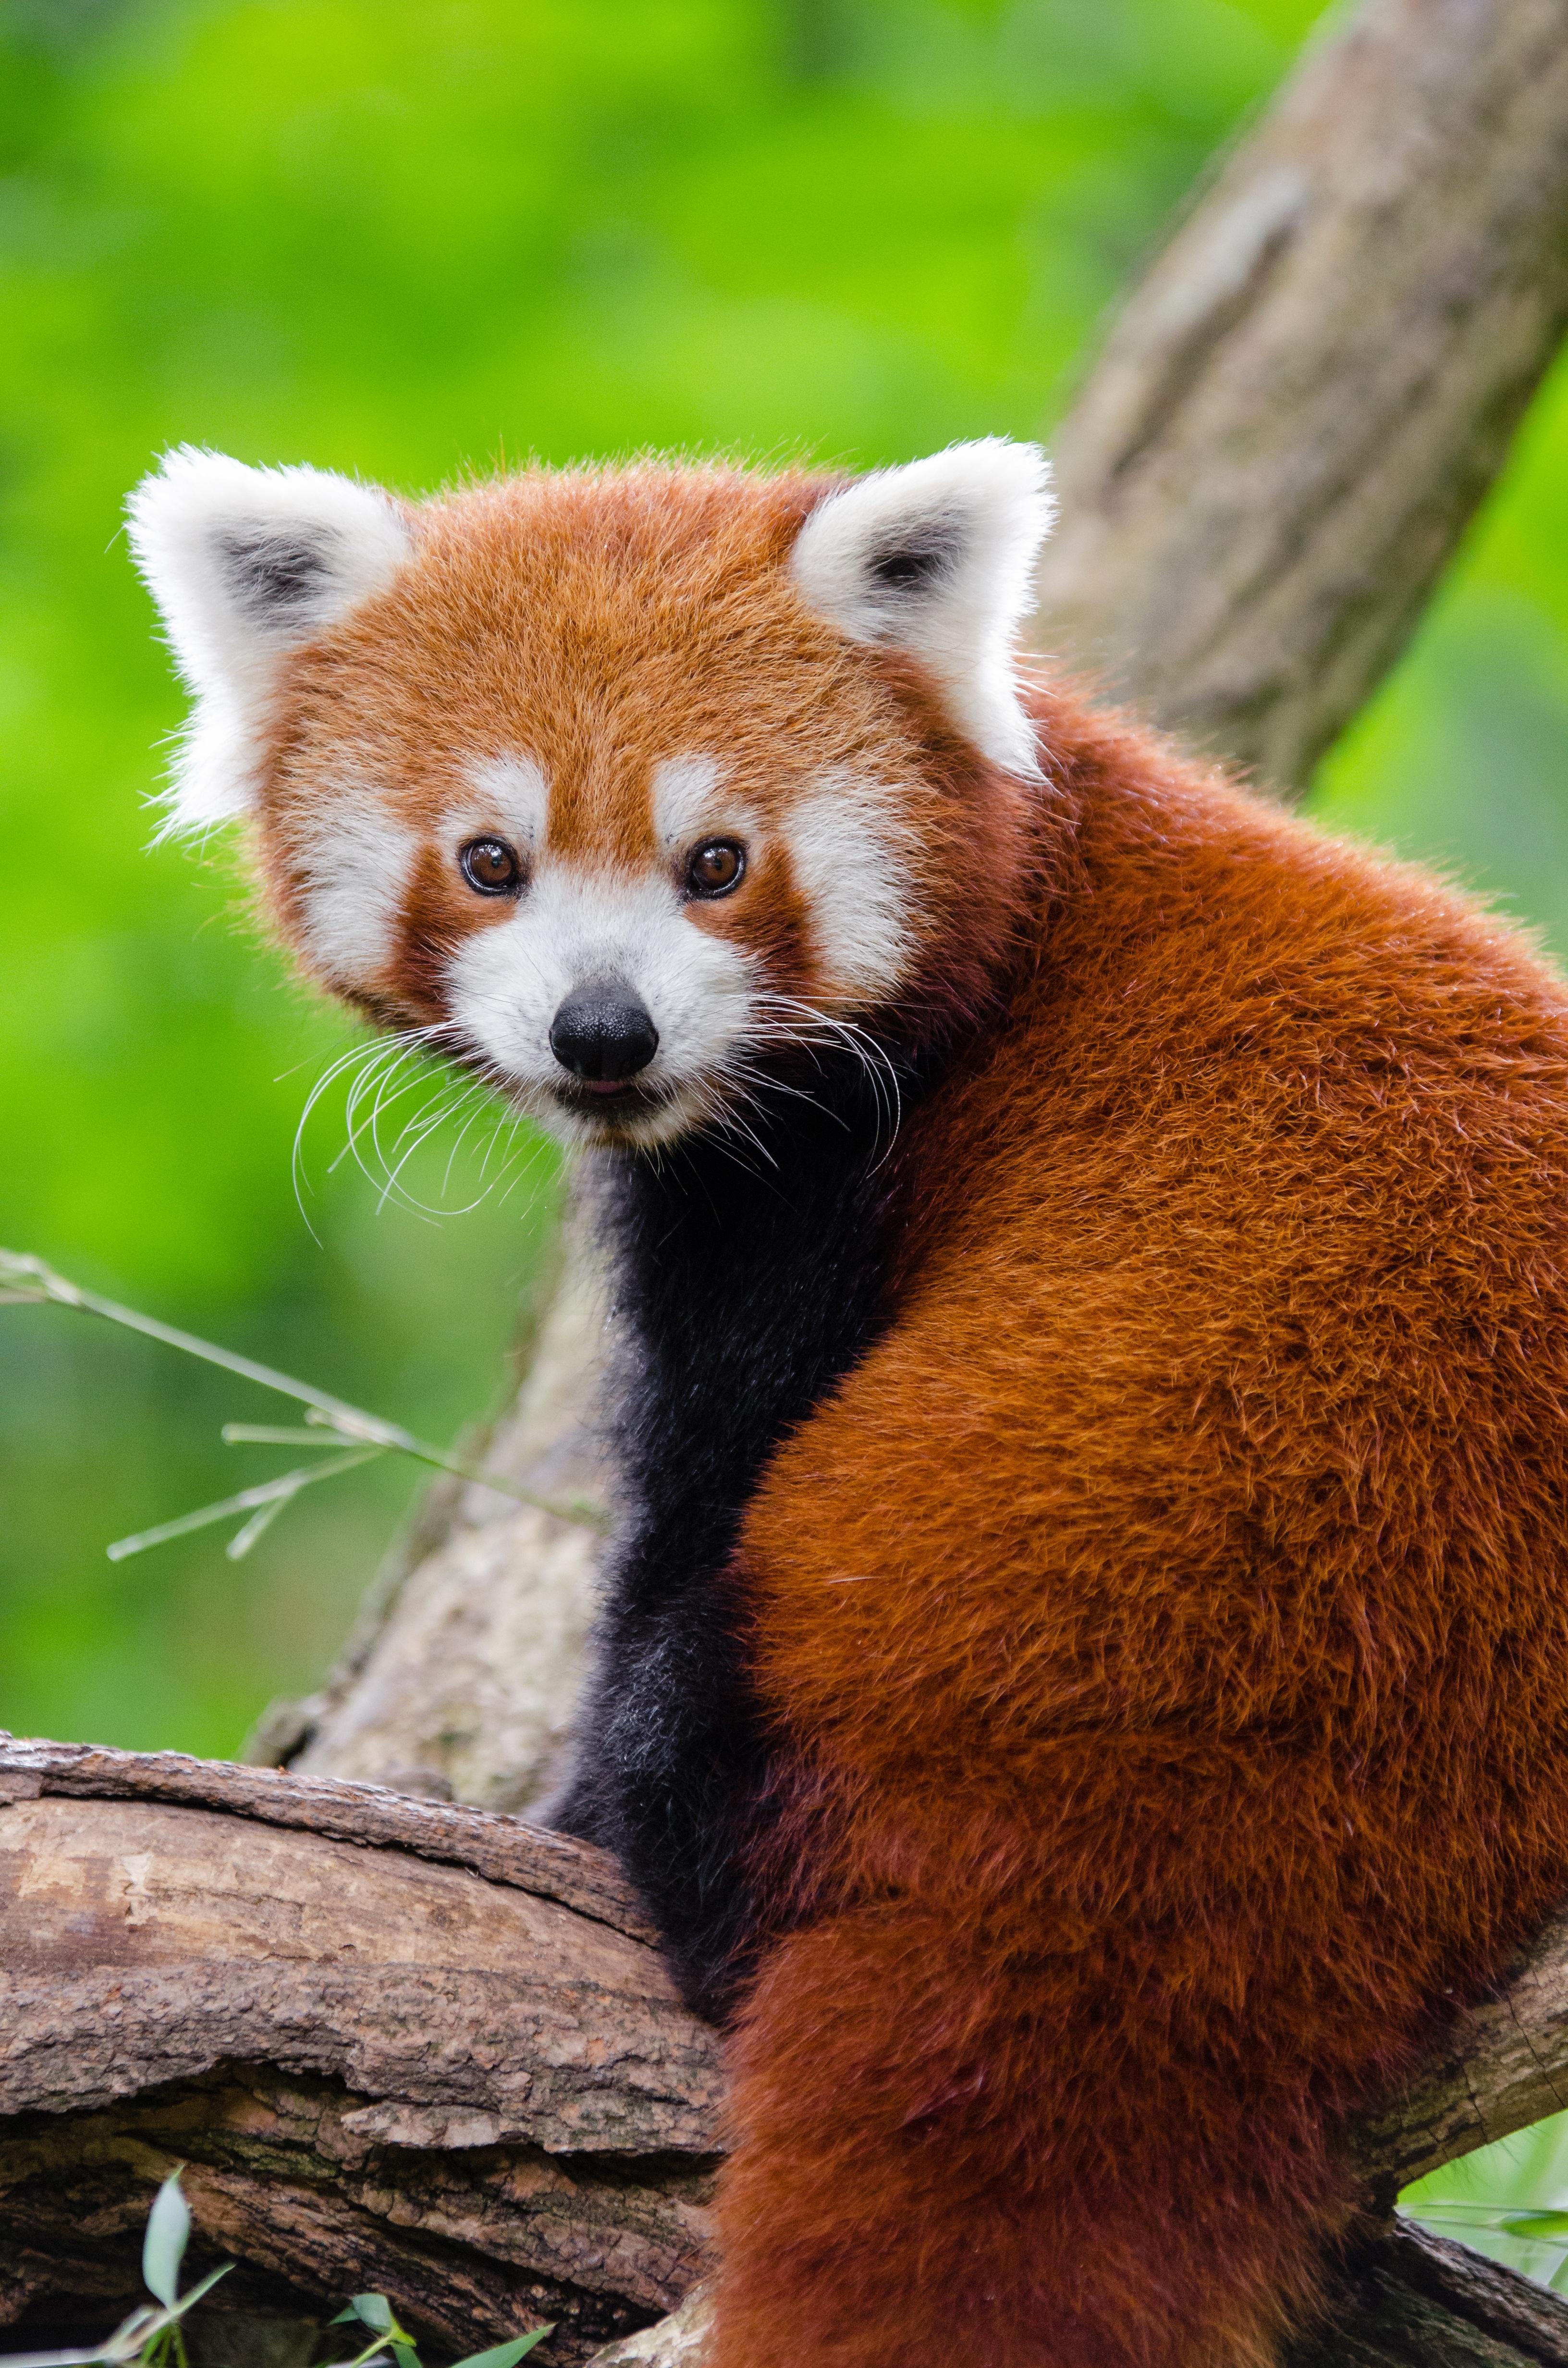 Red Cute Sweet 15 Quinceanera Dresses Img 1099 1st Dress Com: FARK.com: (9749334) Photoshop This Red Panda